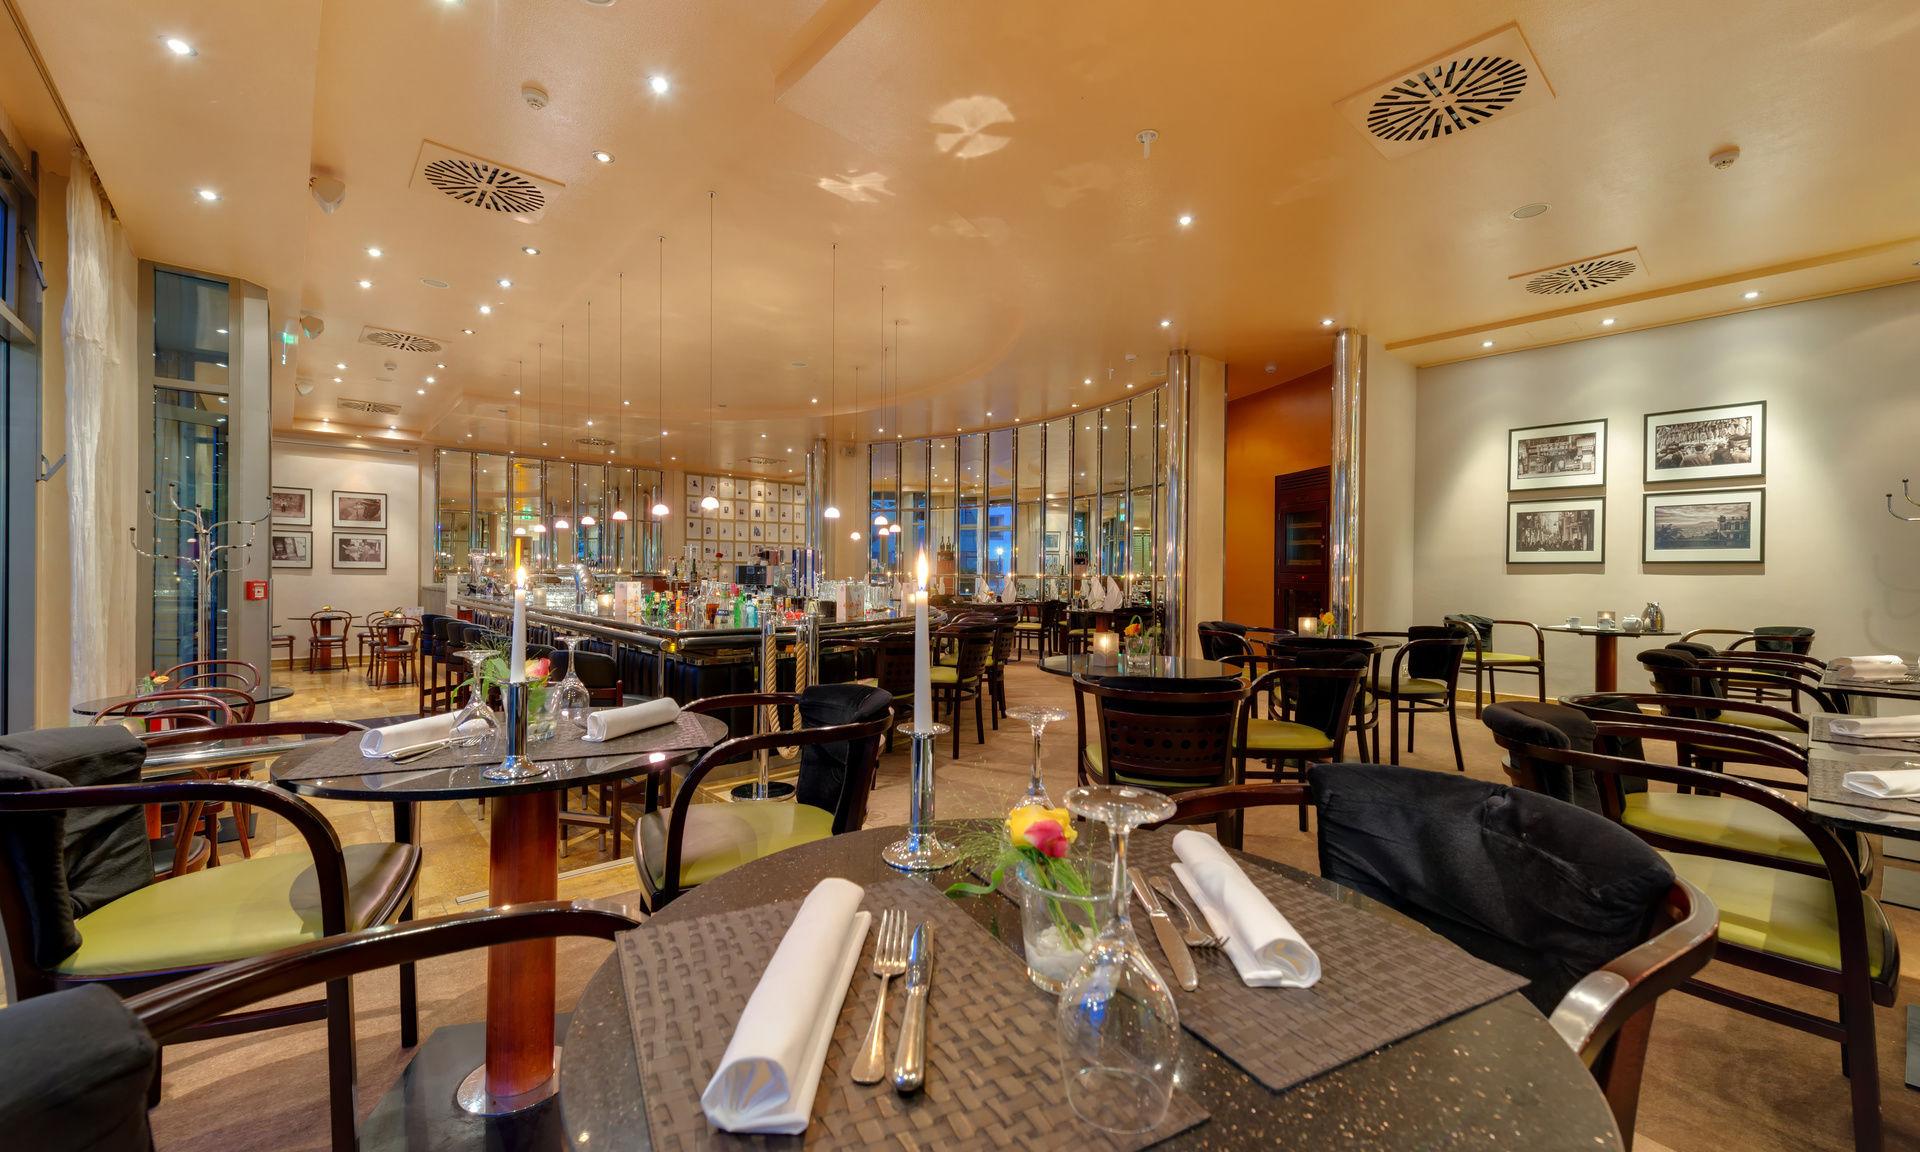 Restaurants Zwickau Restaurant Hotel First Inn Saxony Hotels